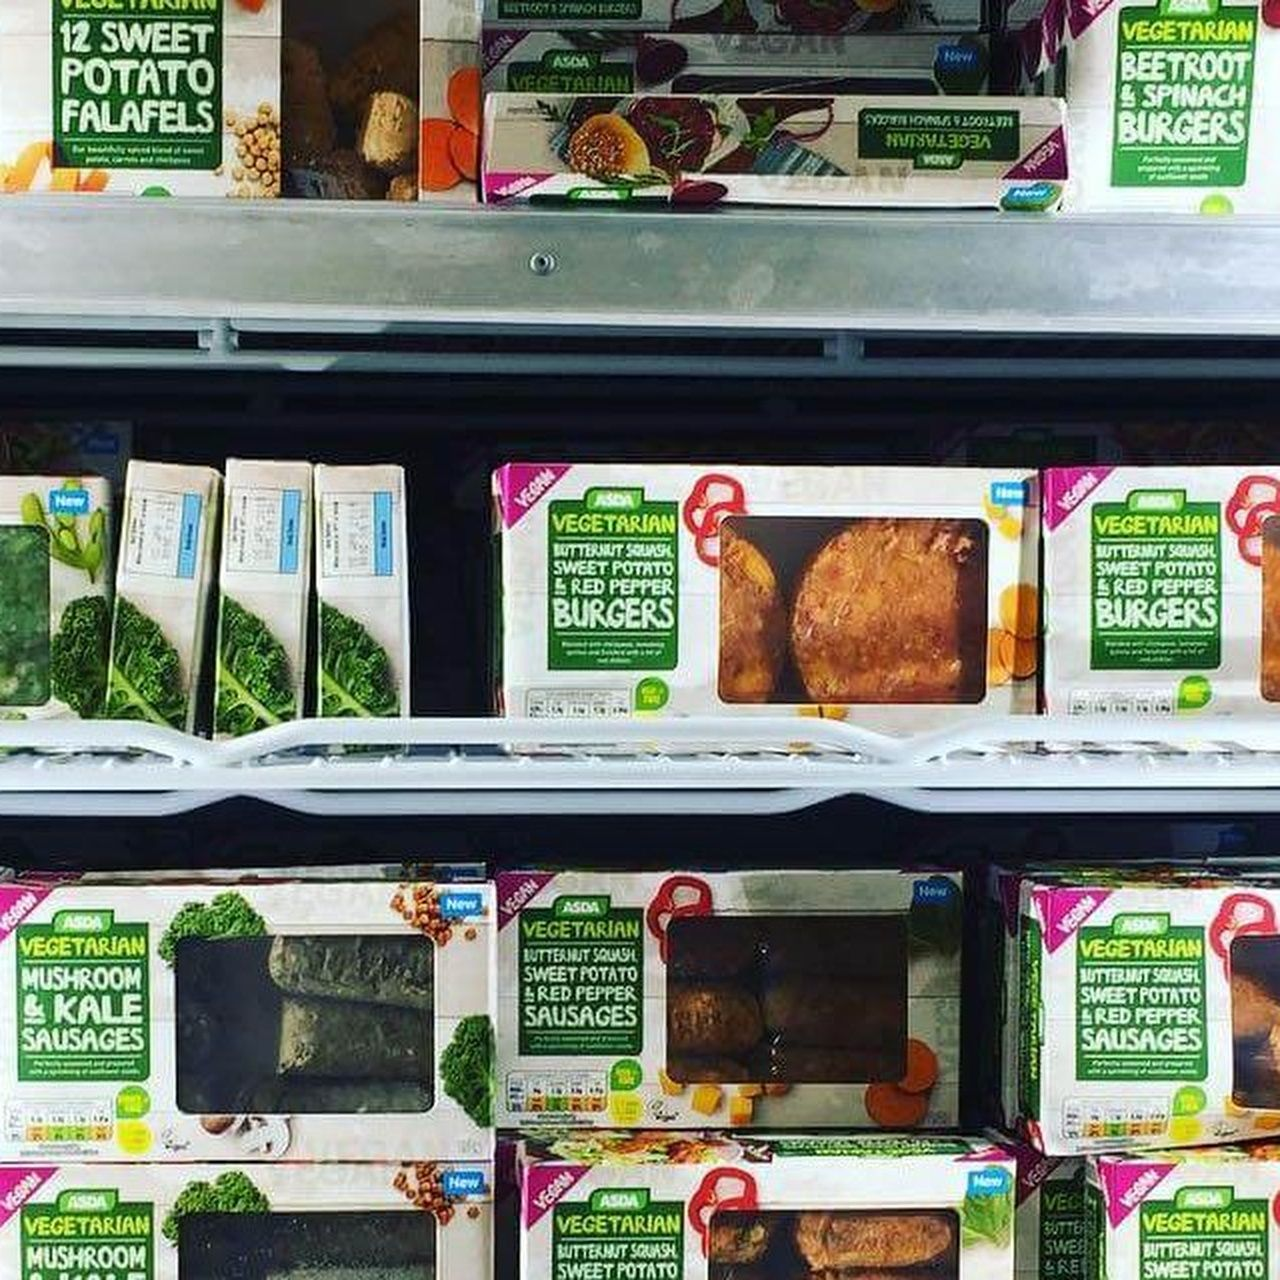 Uk Supermarket Chain Asda Credits Its Sales Spike To Vegan Food Vegannews Vegan Plantbased Power Progress L Vegan Shopping Vegan News Vegan Recipes